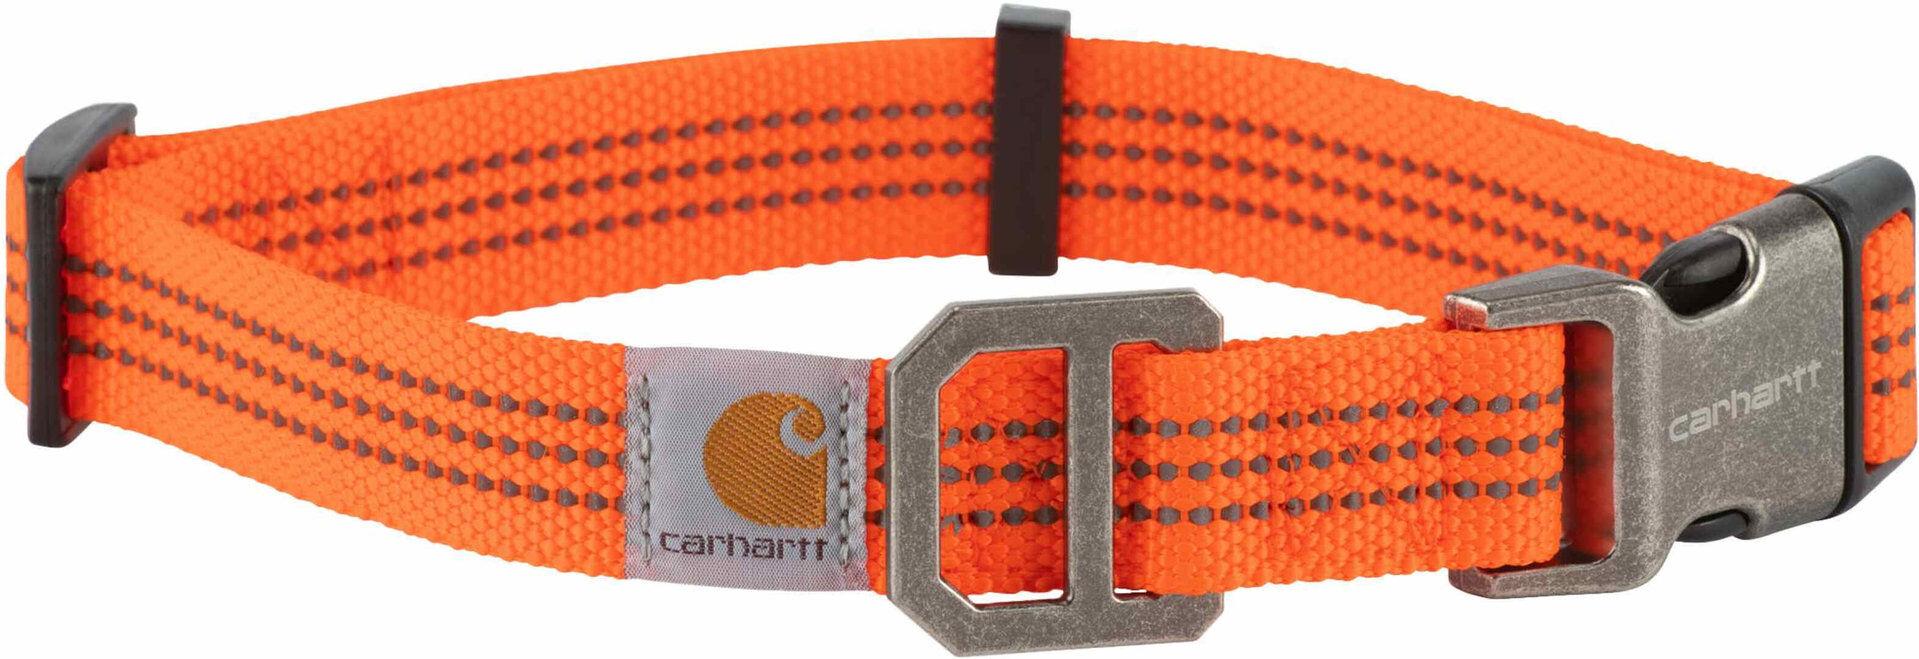 Carhartt Tradesman Hund Krave